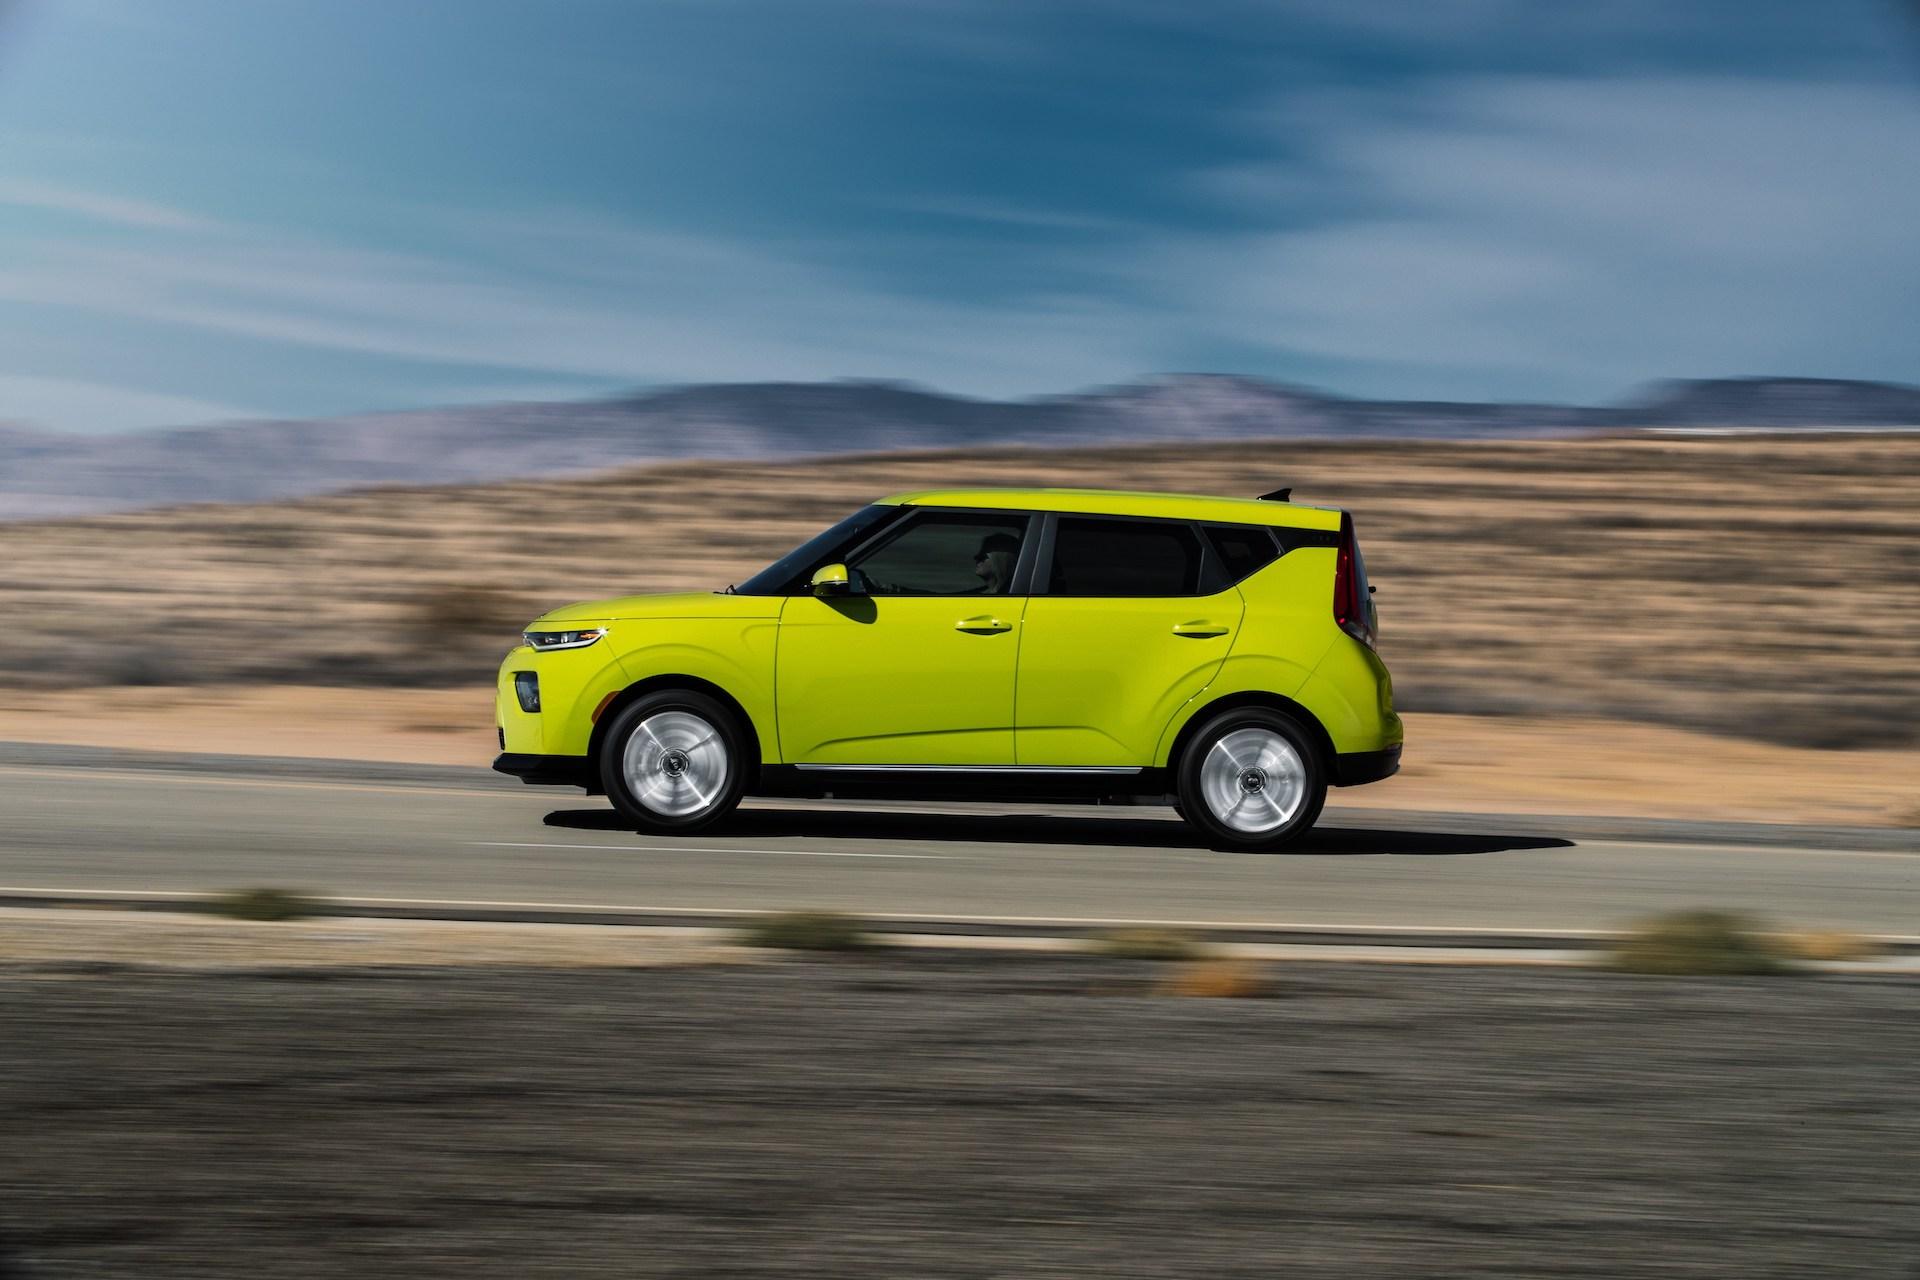 Tesla batteries, EPA comments, Hyundai and Kia plug-in